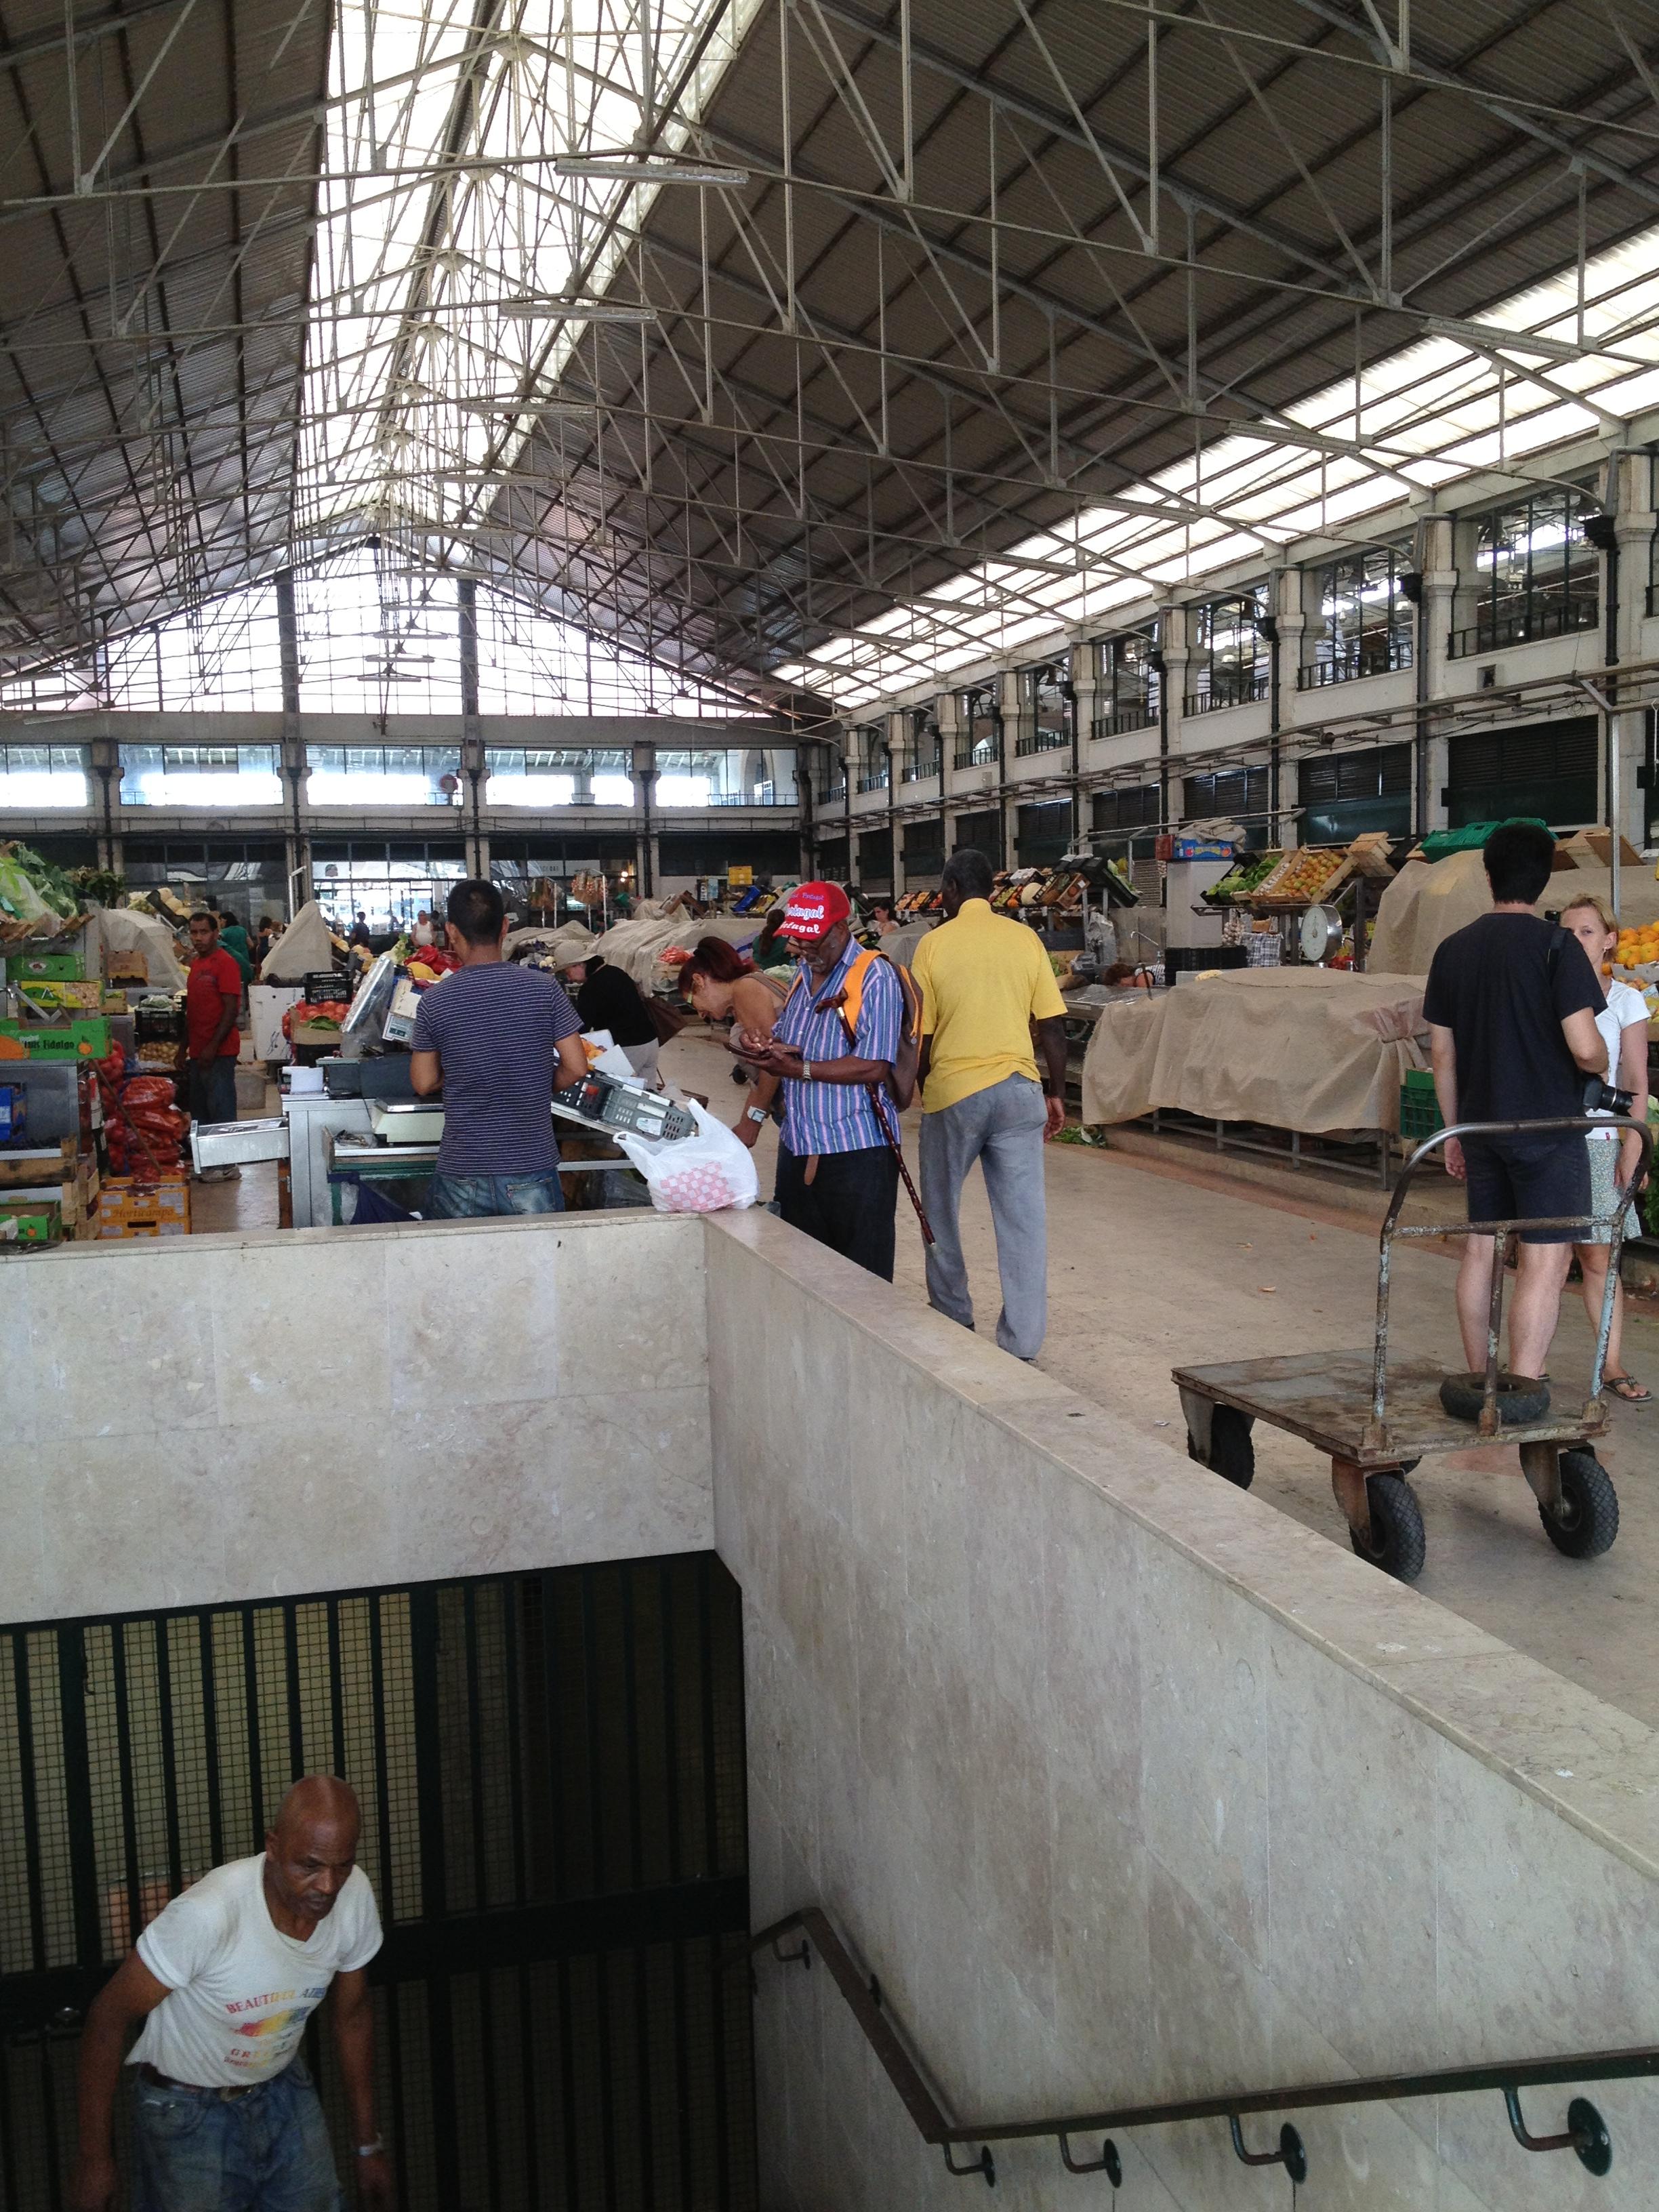 Fish markets and flea markets salted earth for Fishing flea market near me